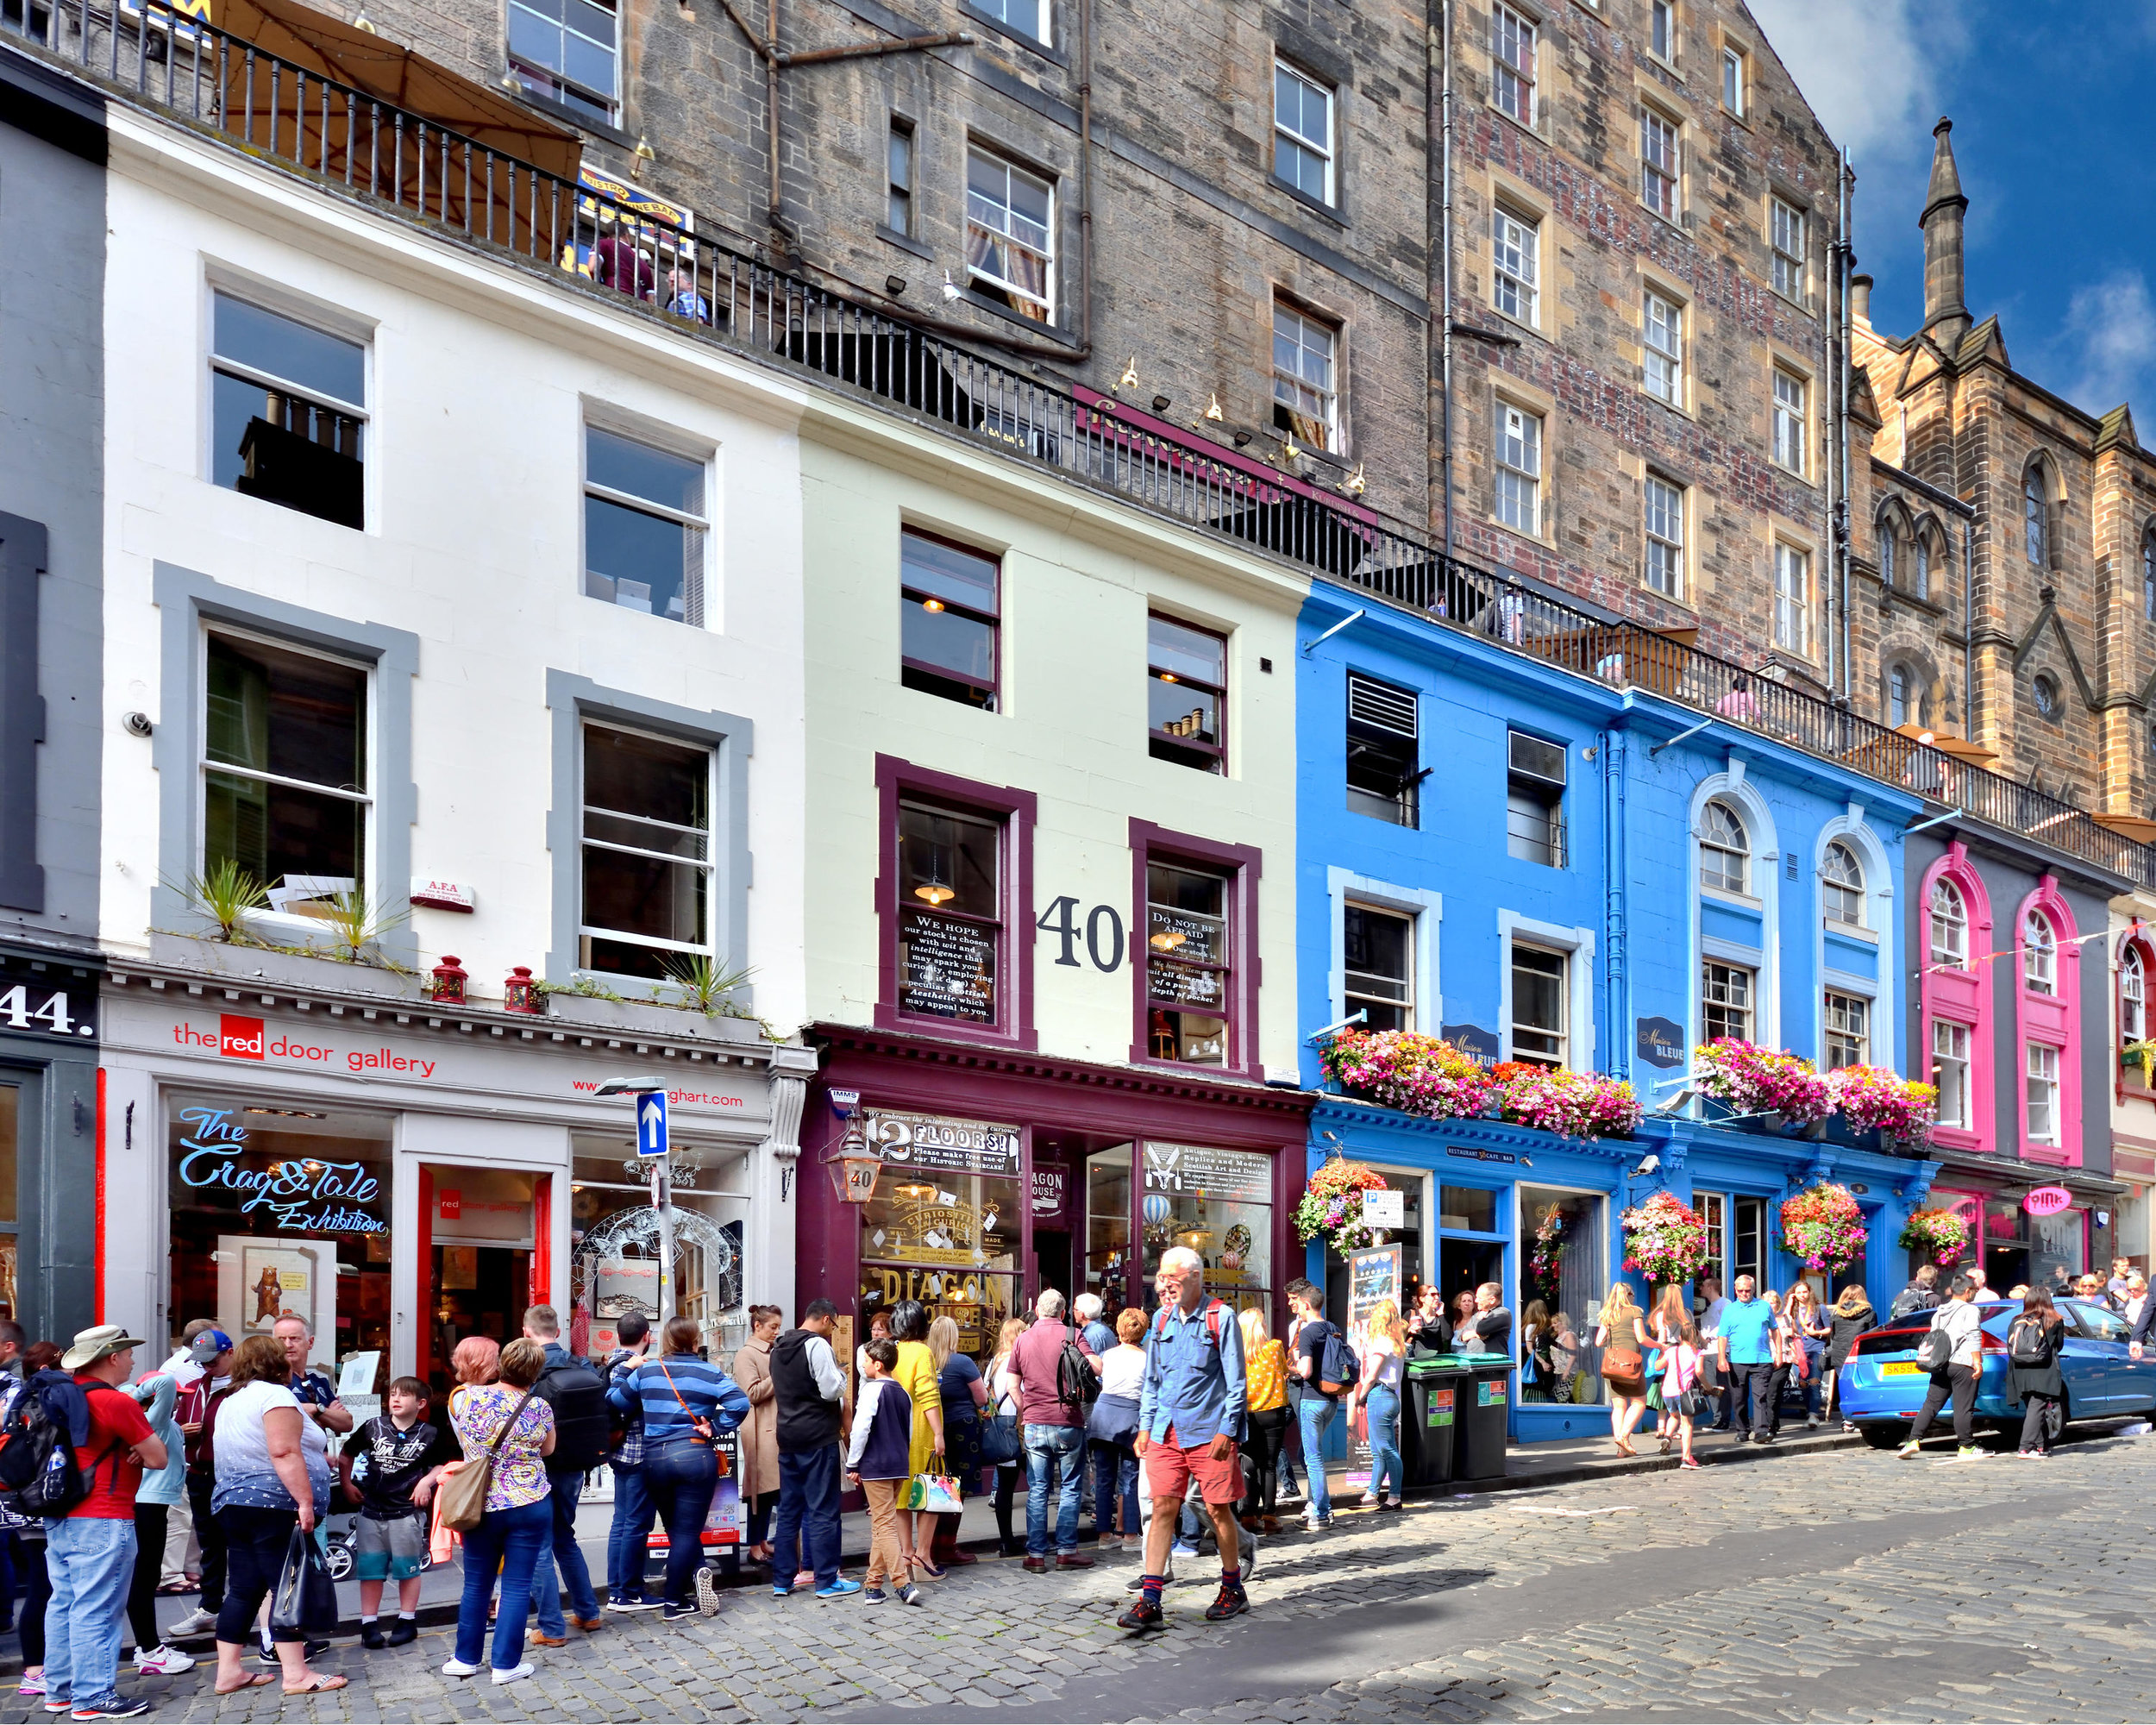 Old Town, Scotland